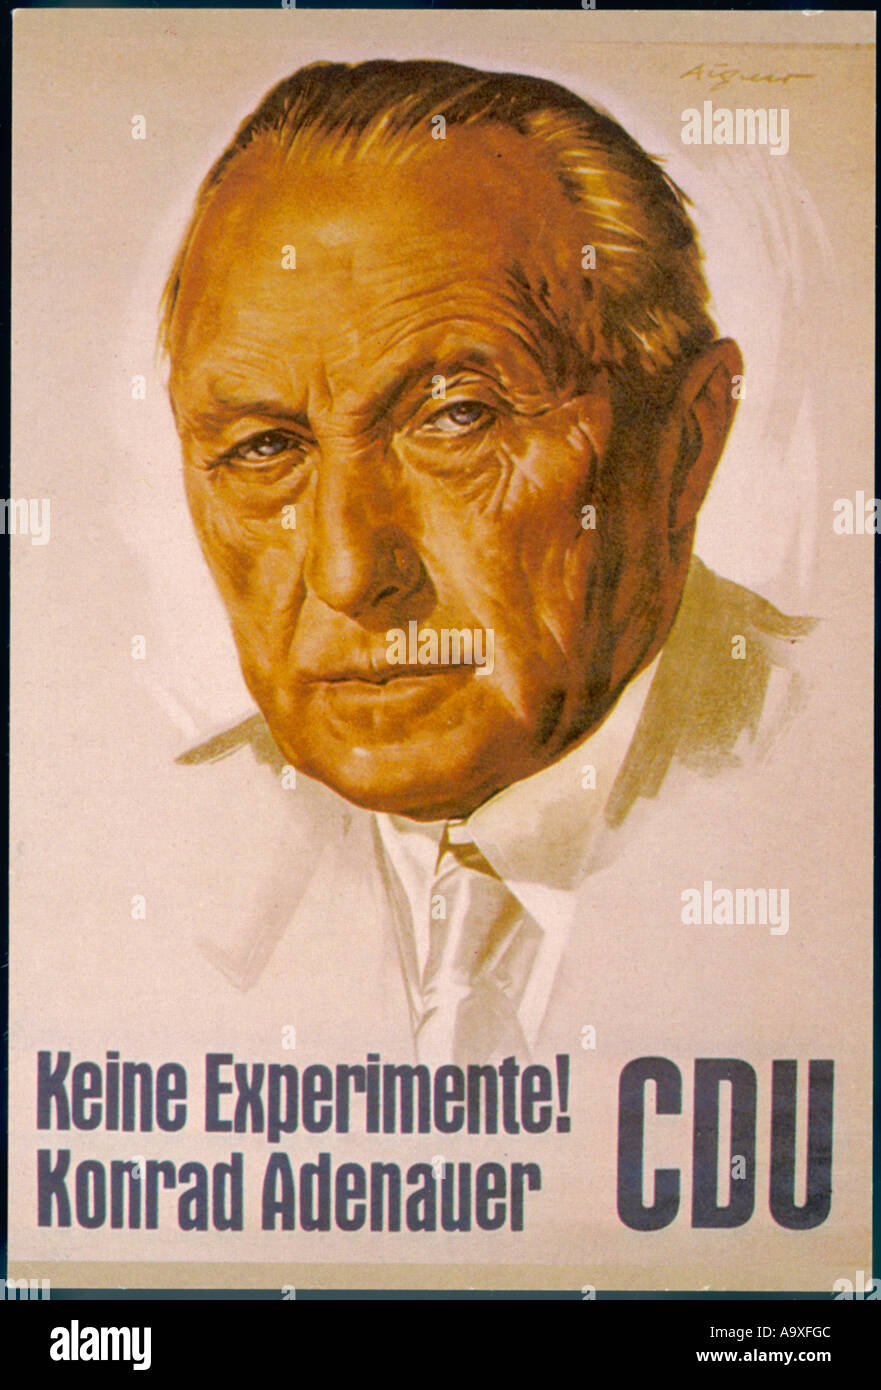 Konrad Adenauer Campaign Poster - Stock Image